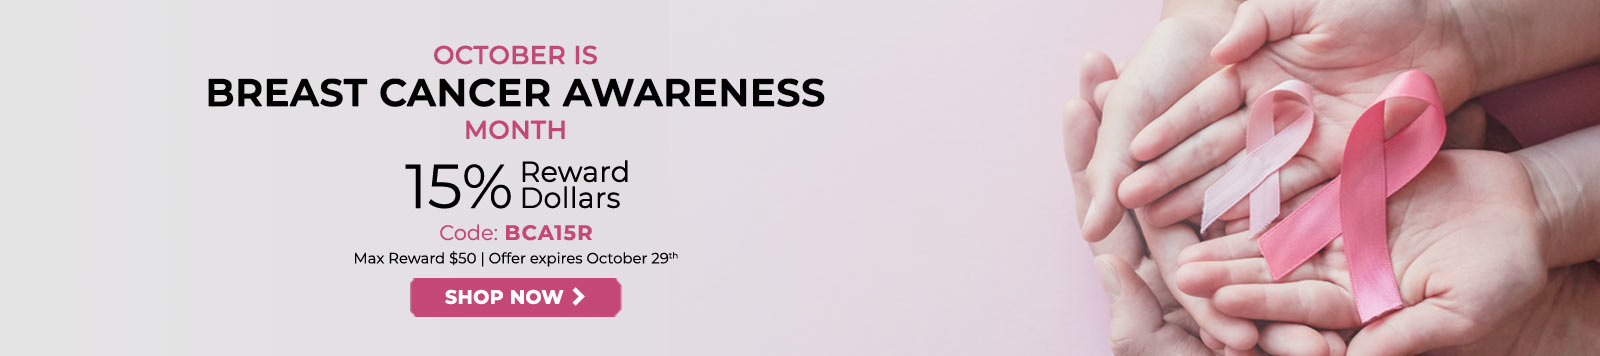 HPFY Breast Cancer